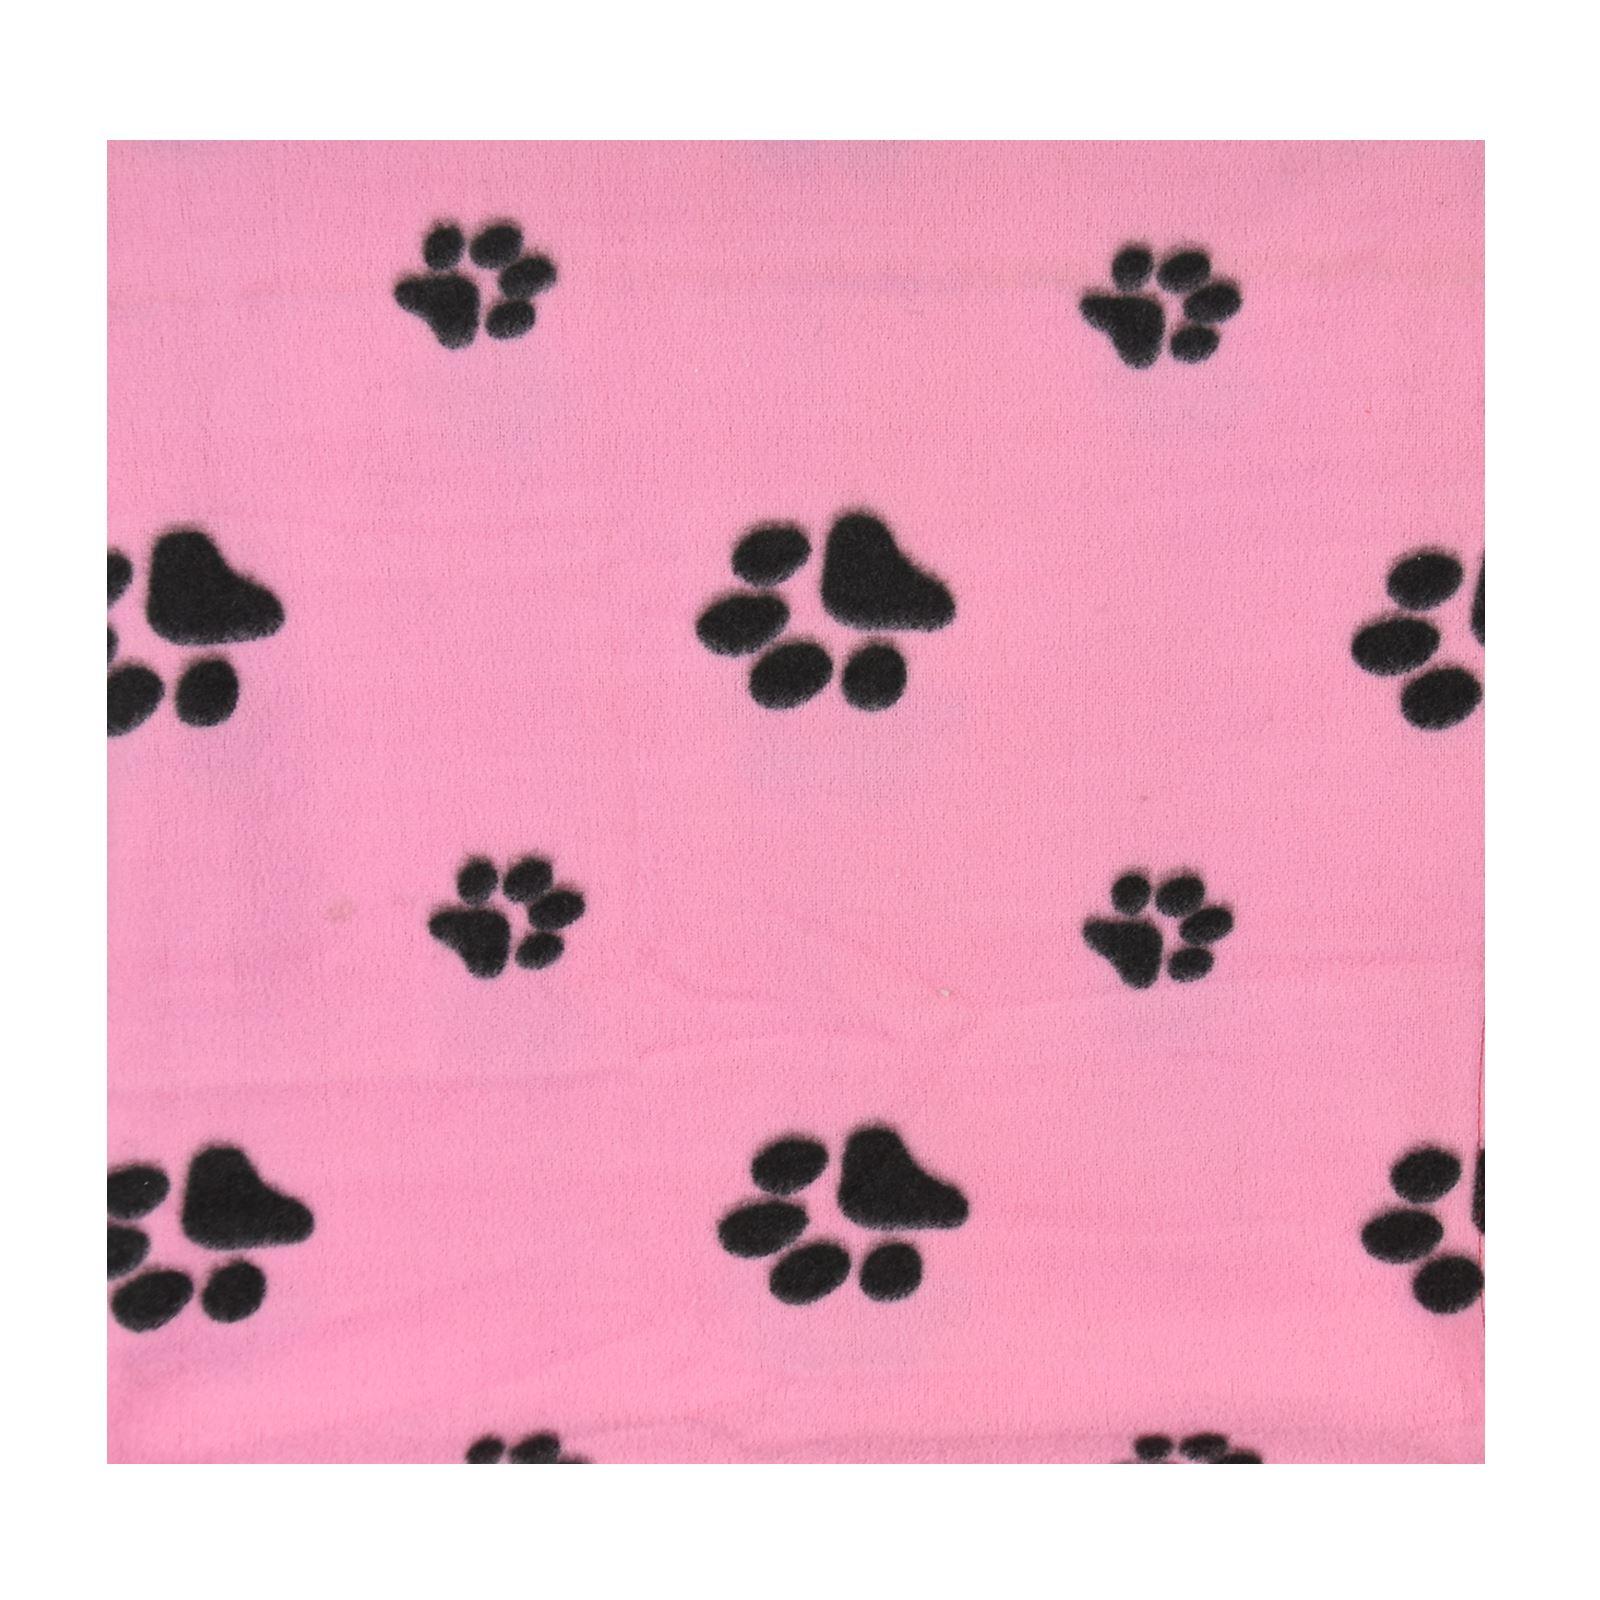 Warm-Pet-Mat-Paw-Print-Cat-Dog-Puppy-Fleece-Soft-Blanket-Bed-Cushion-One-Size thumbnail 15